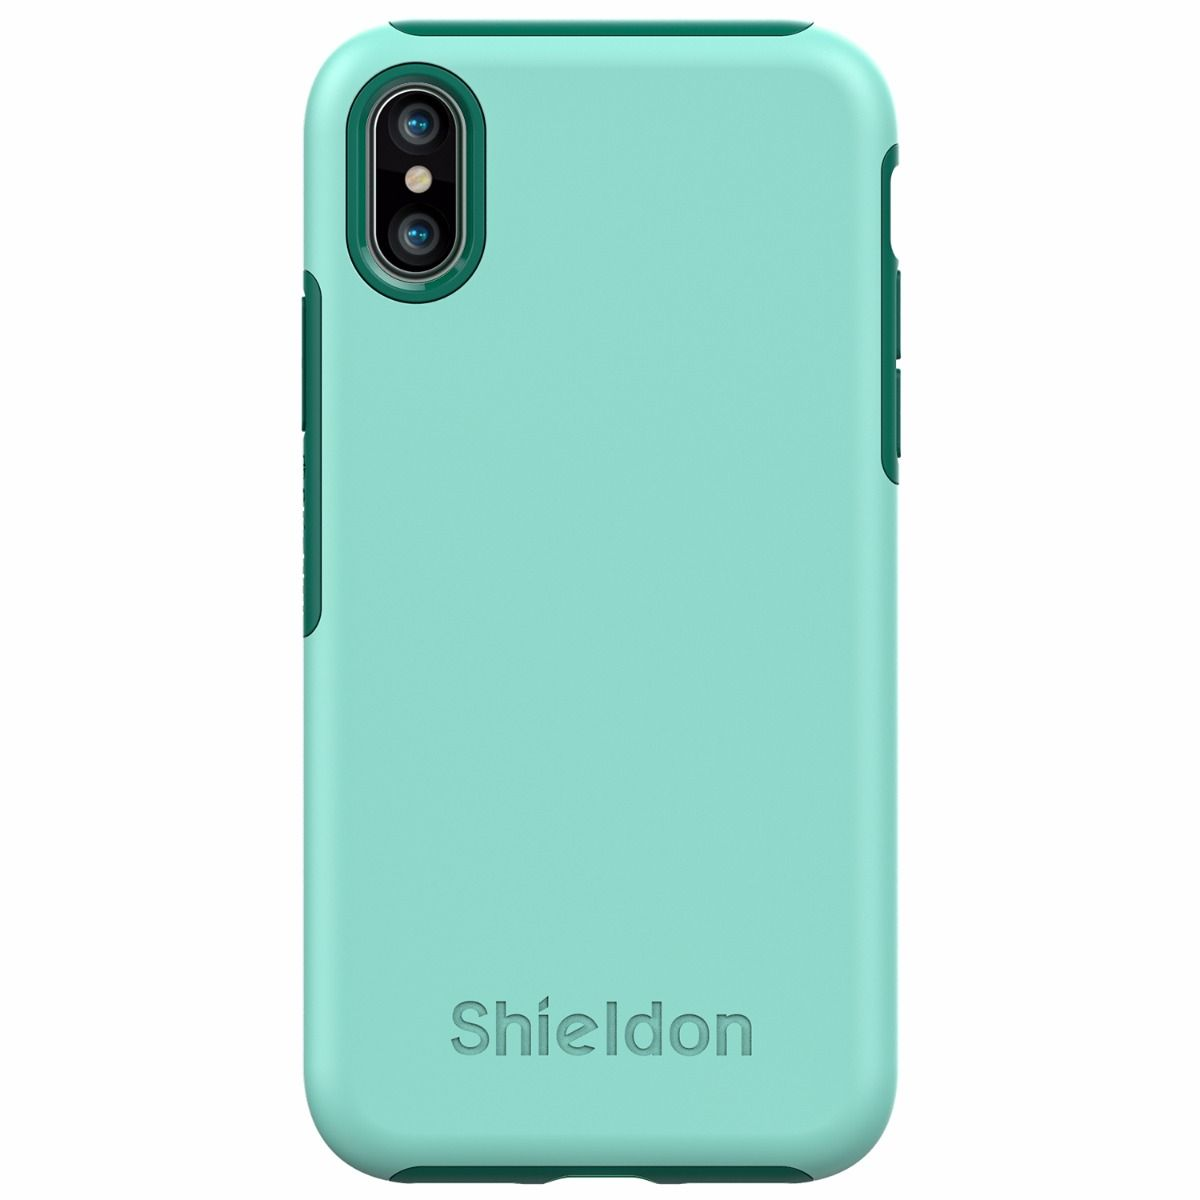 Iphone X Case Drop Test